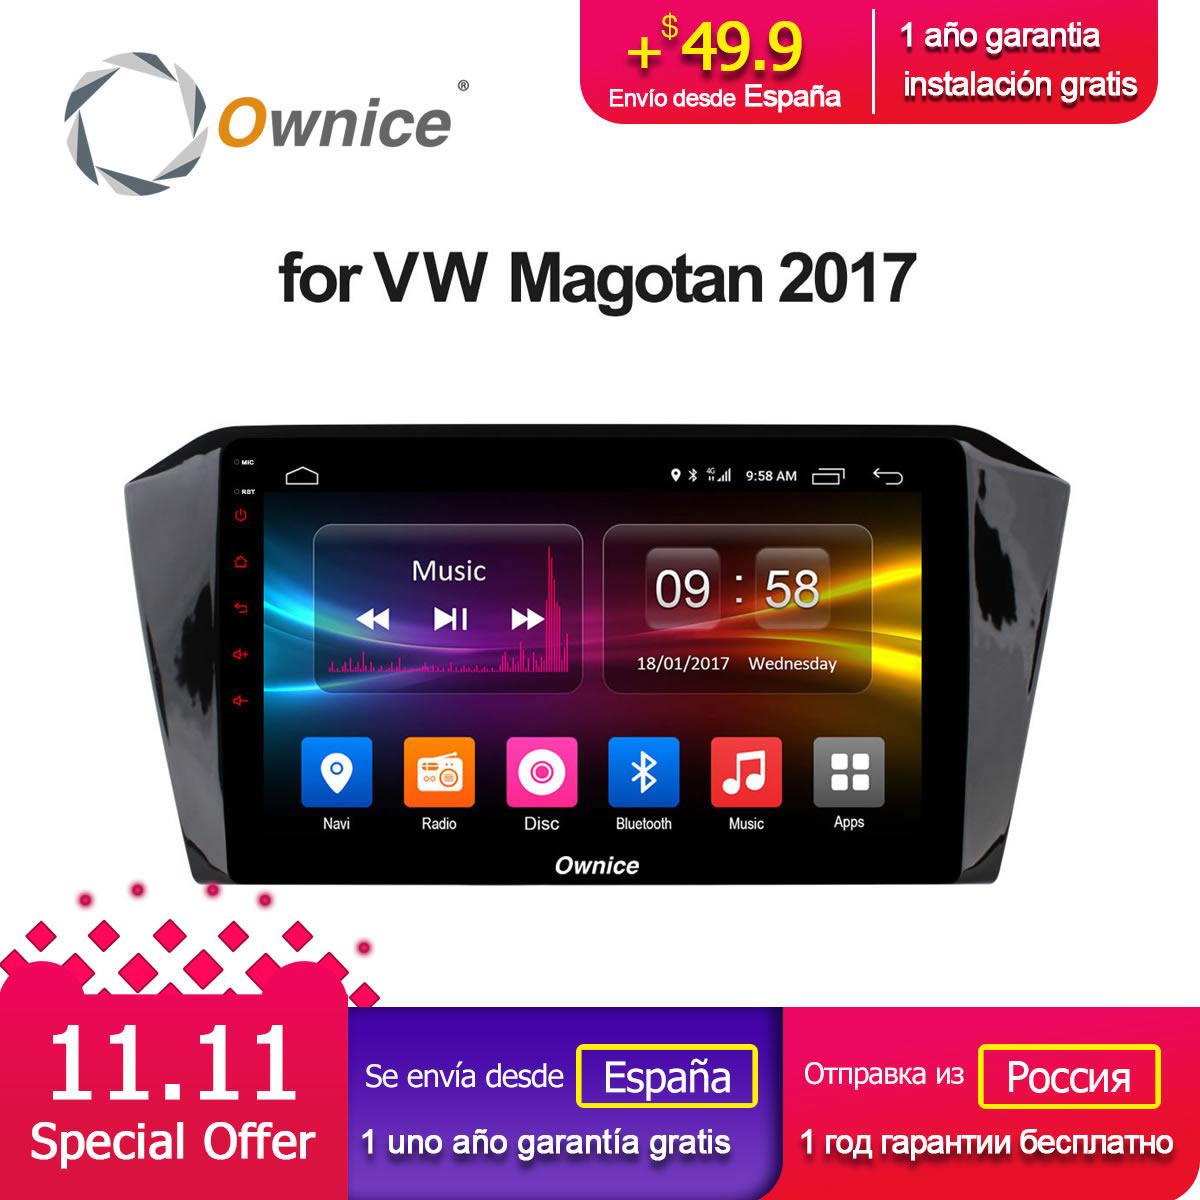 Ownice C500+ G10 10.1 Car DVD Player 8 Octa Core Android 8.1 GPS For Volkswagen Golf 7 MK7 VII 2017 2 din Radio 2GB Support 4G ownice c500 4g sim lte octa 8 core android 6 0 for kia ceed 2013 2015 car dvd player gps navi radio wifi 4g bt 2gb ram 32g rom